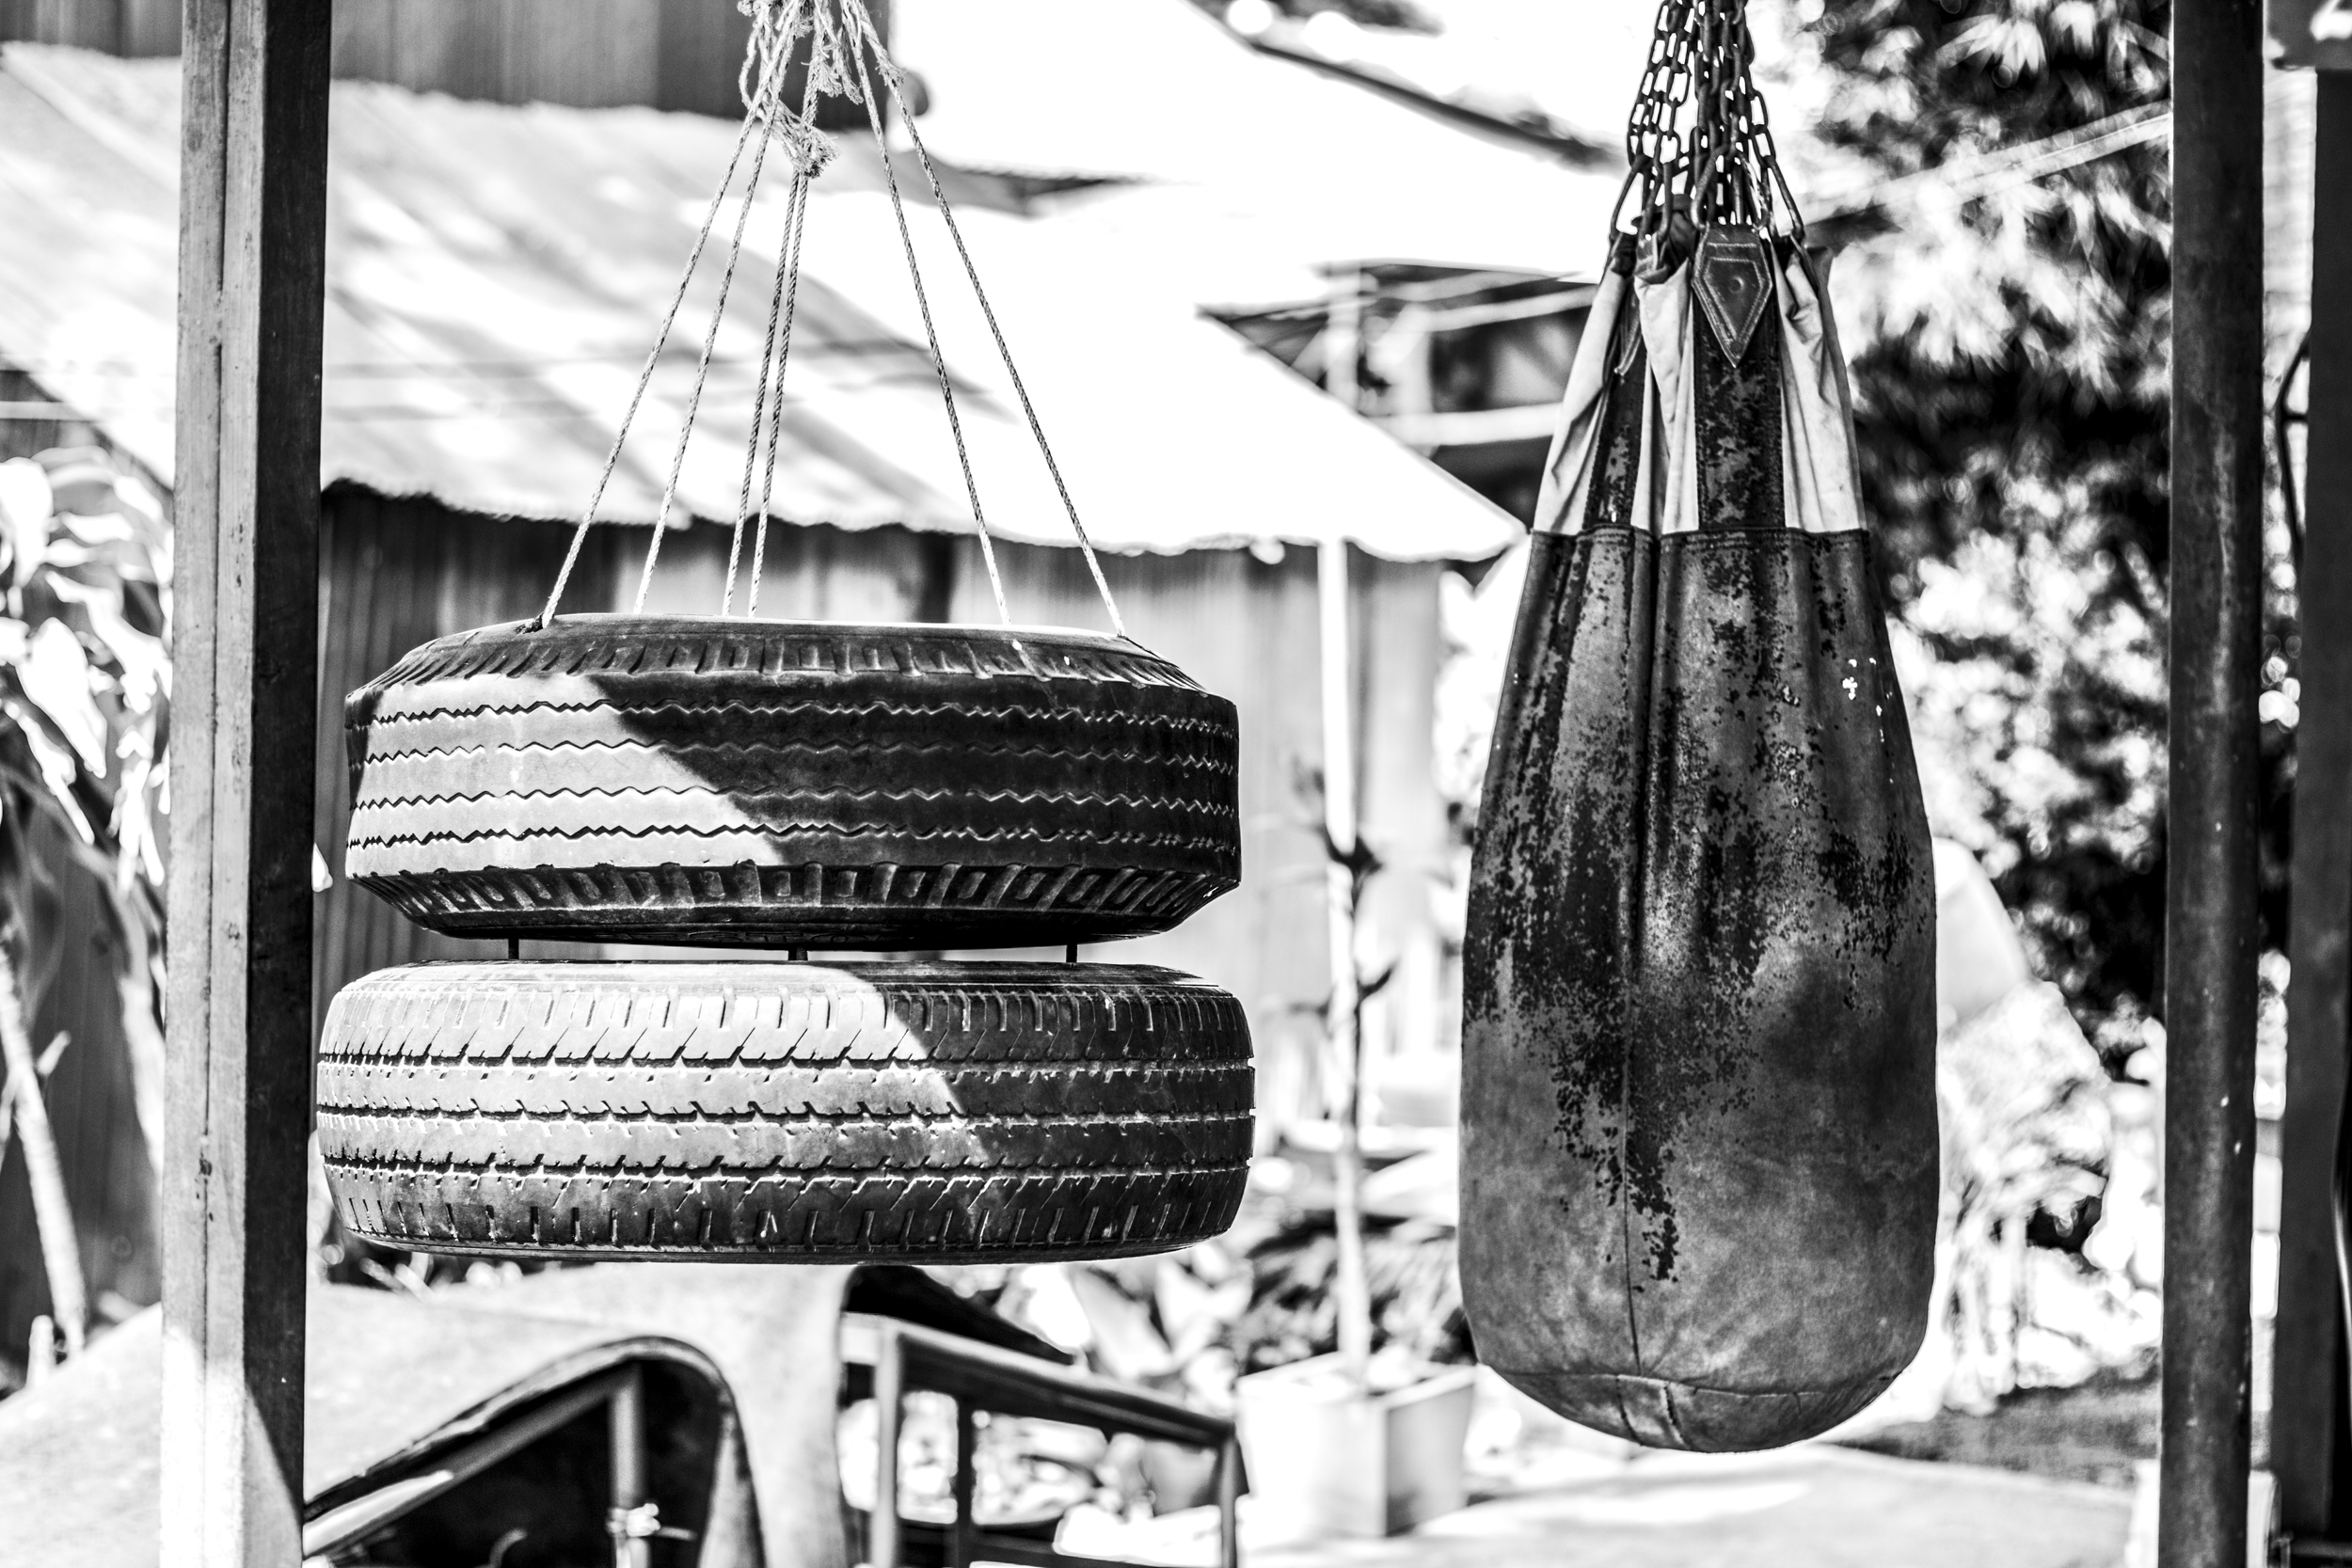 Basic Training (July 11, 2014 - Tha Sala, Thailand)